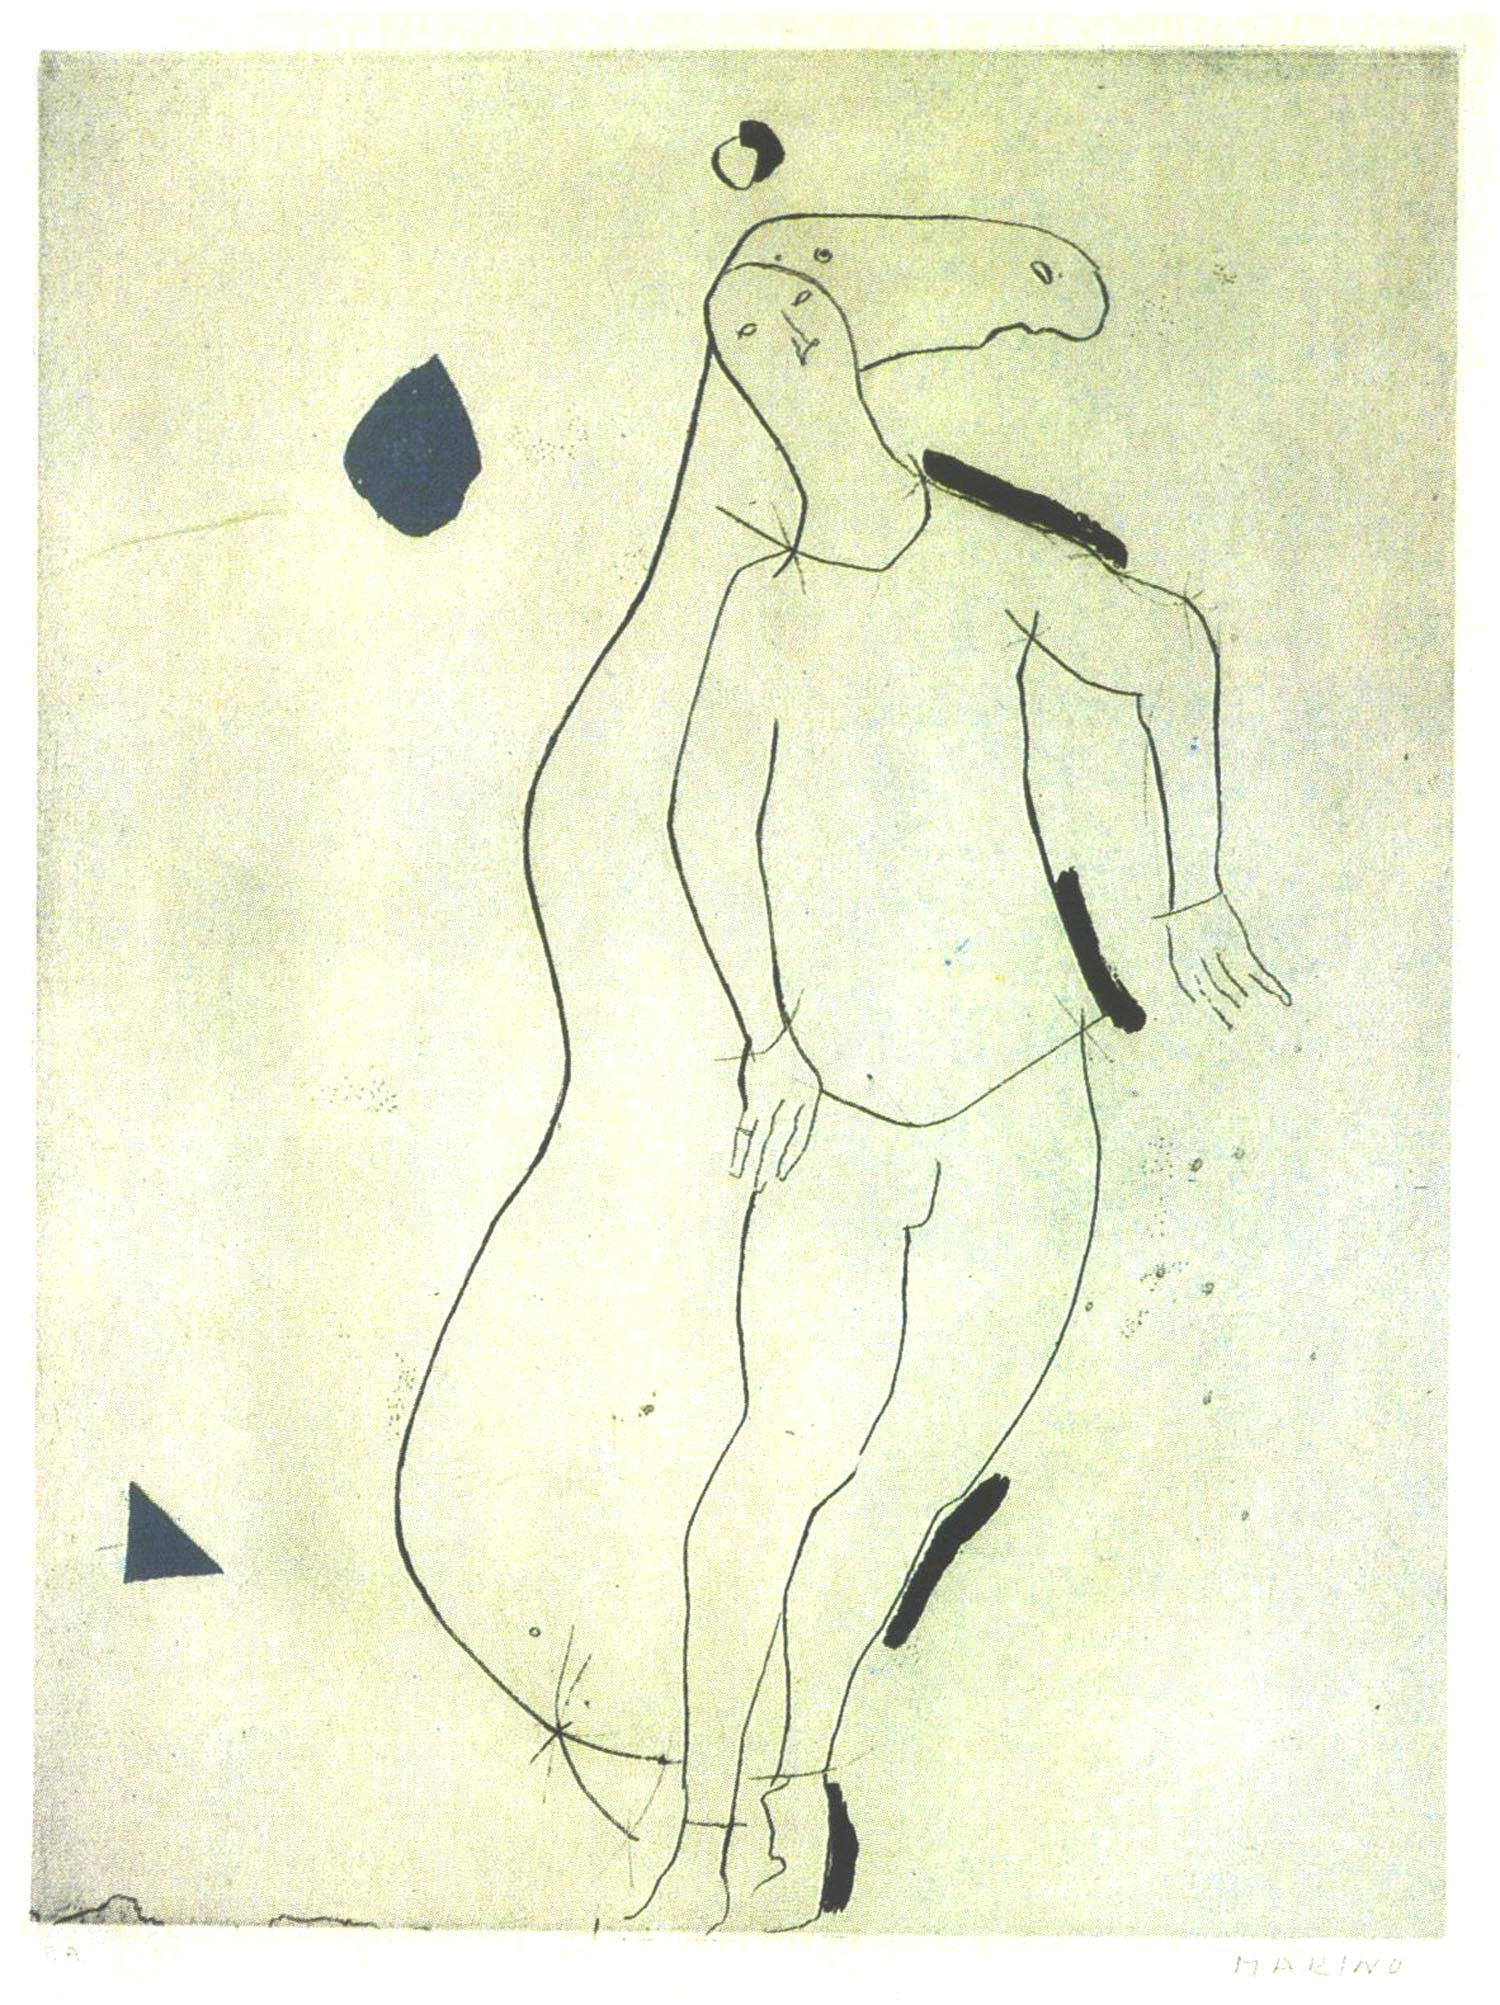 alt La Sorpresa I, from Personaggi, Plate III, 1973